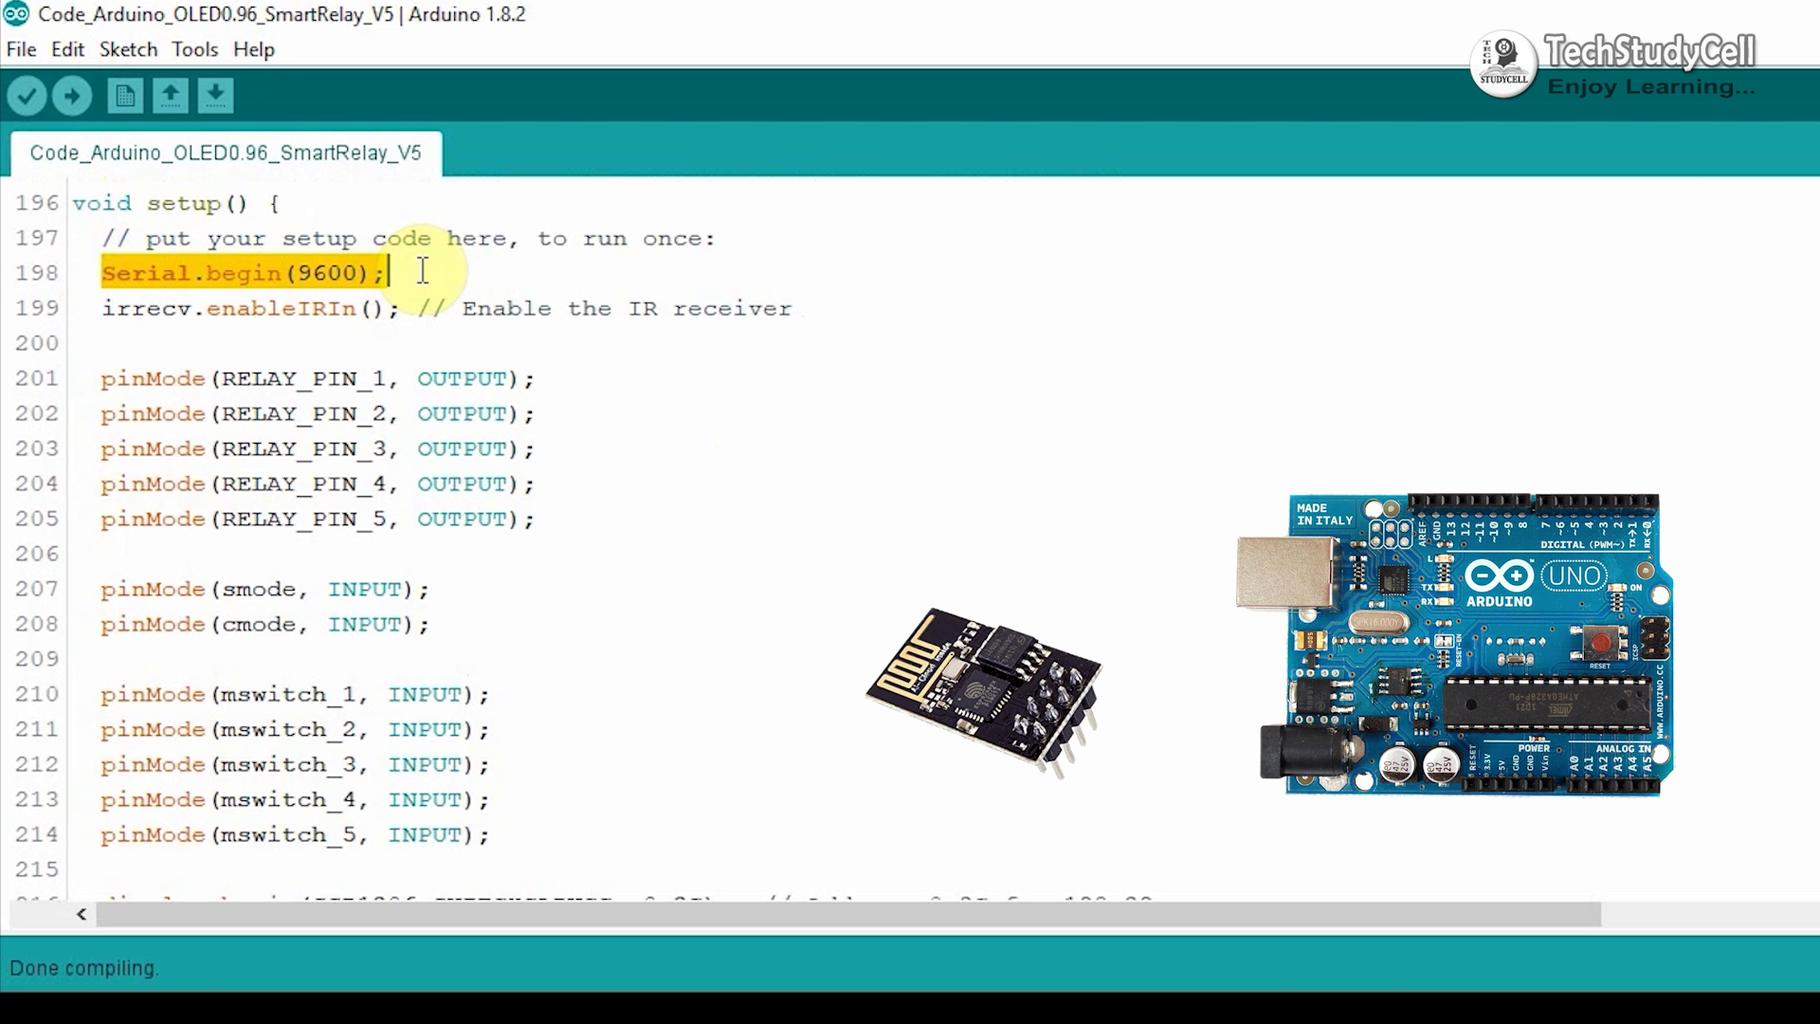 Program the Atmega328 Microcontroller